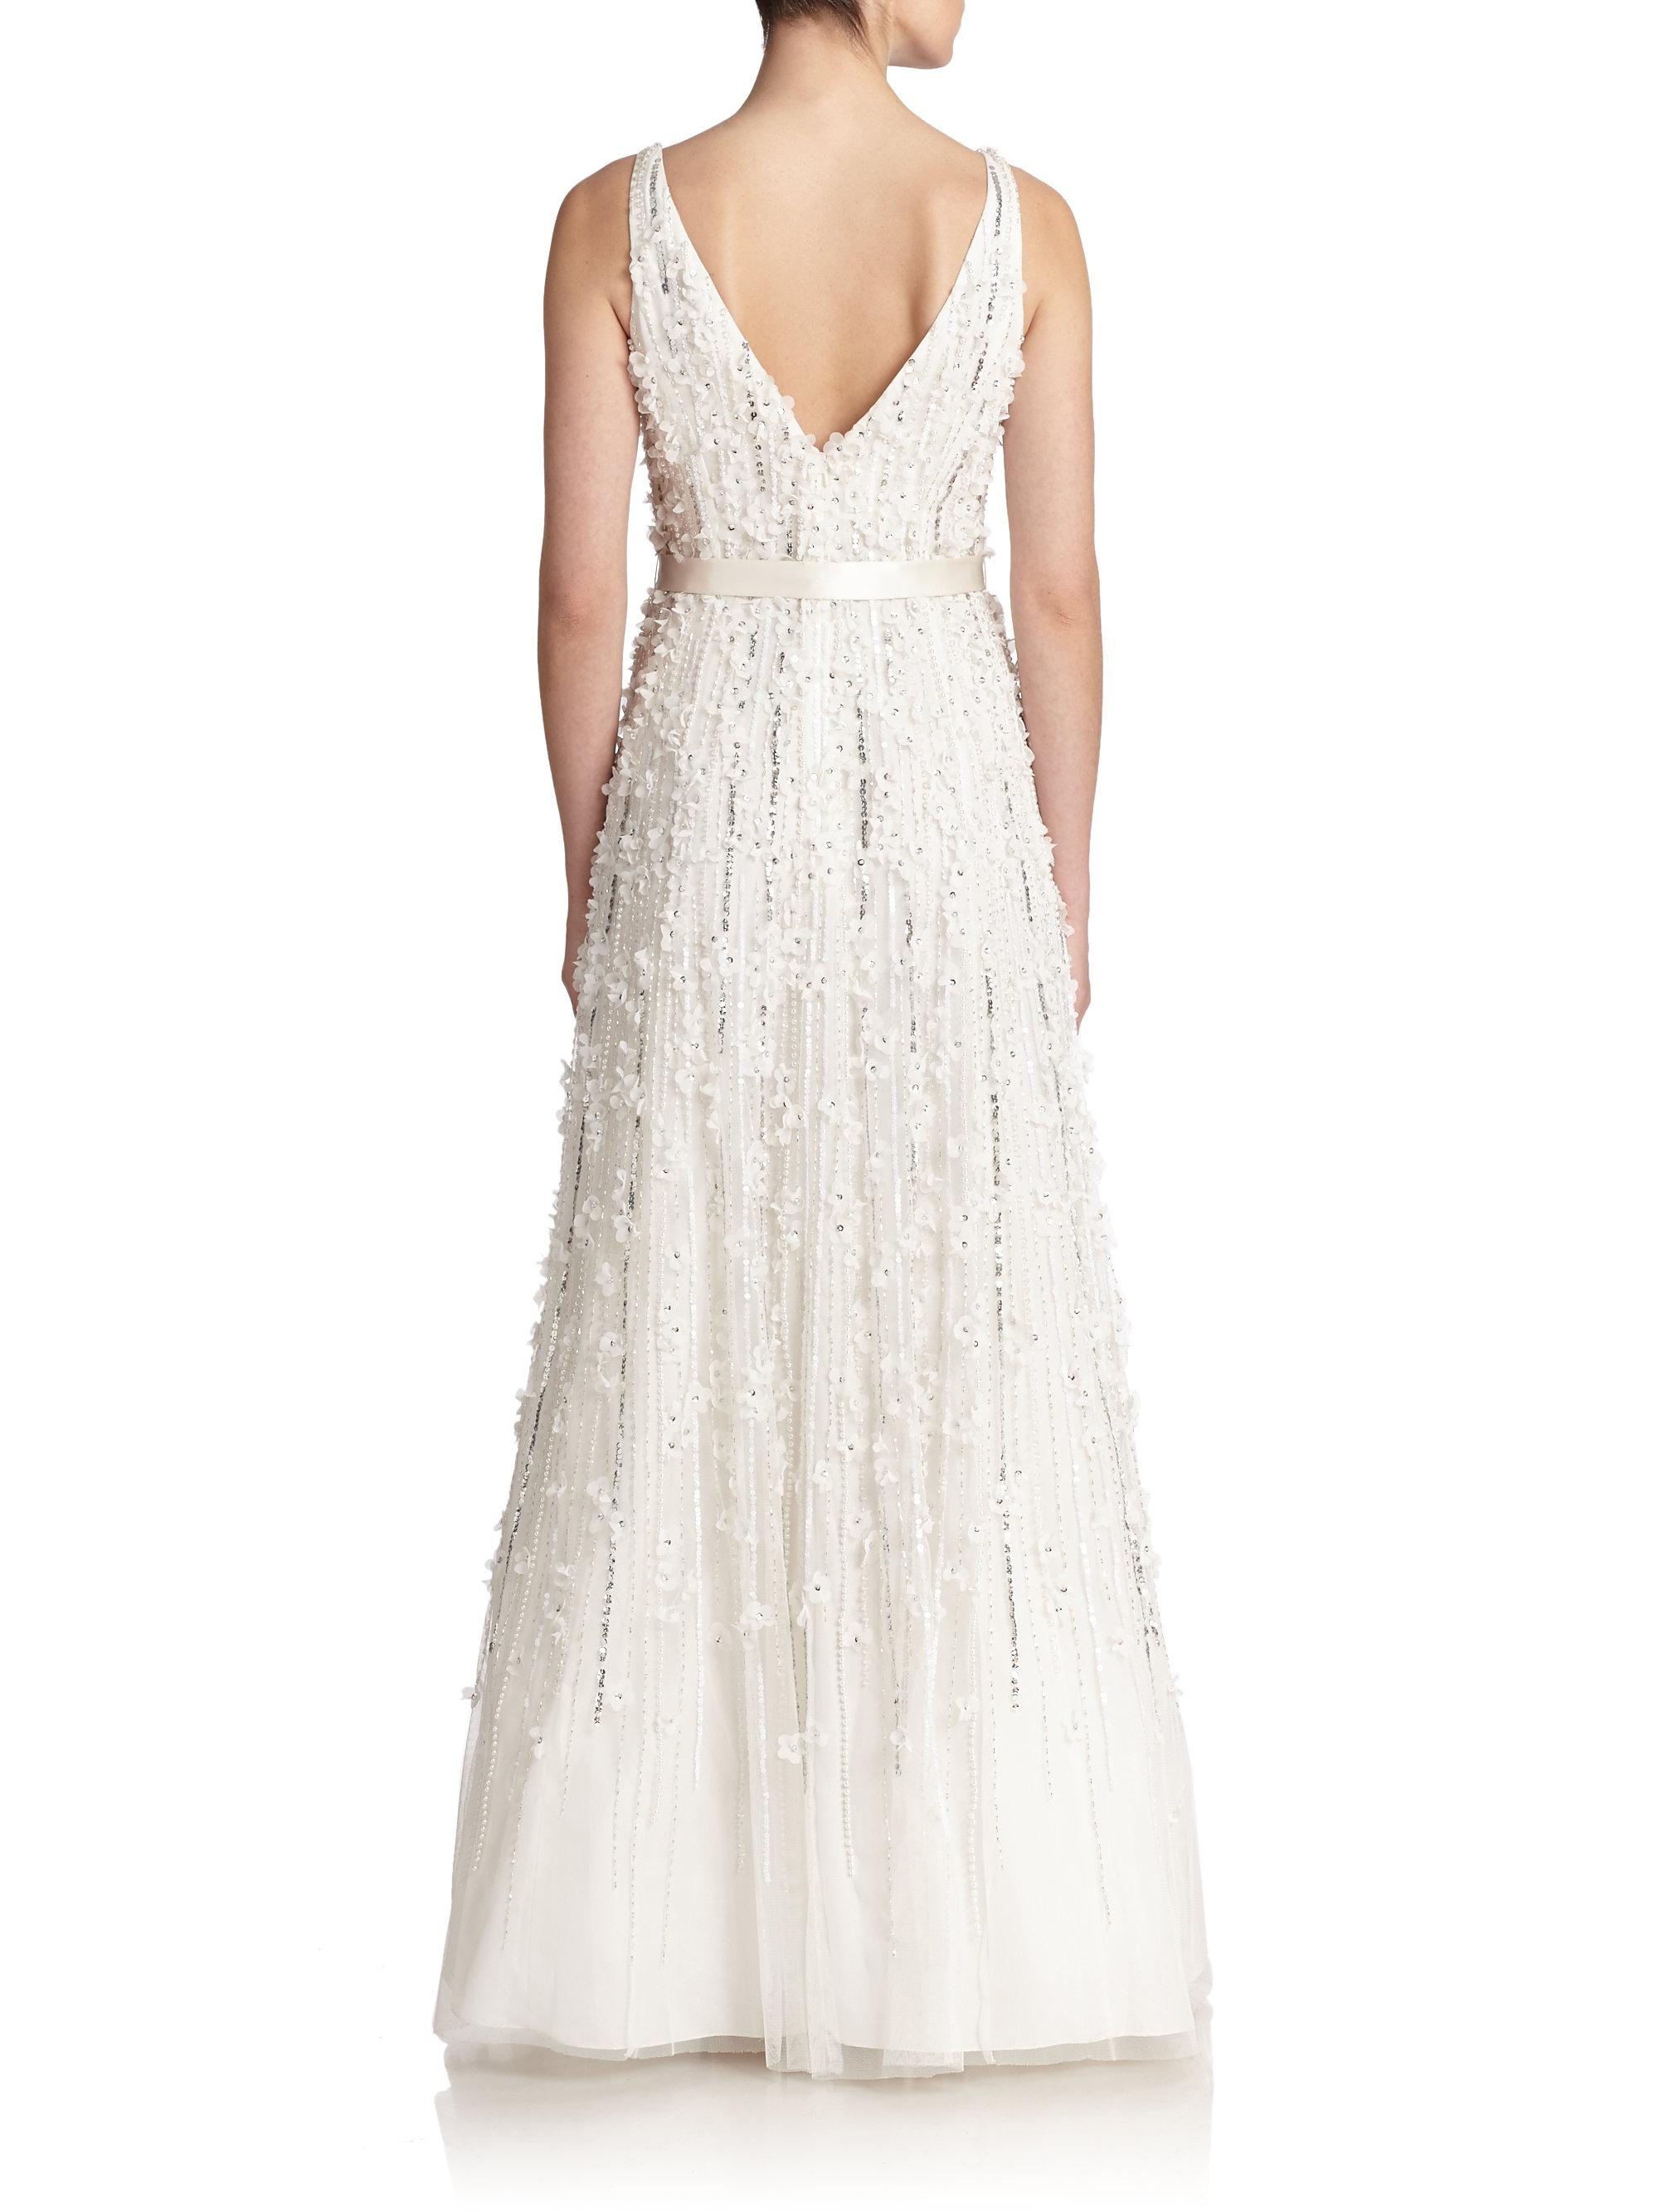 0a89ef83bde0 Lyst - Basix Black Label Flower Appliqué Satin Gown in White